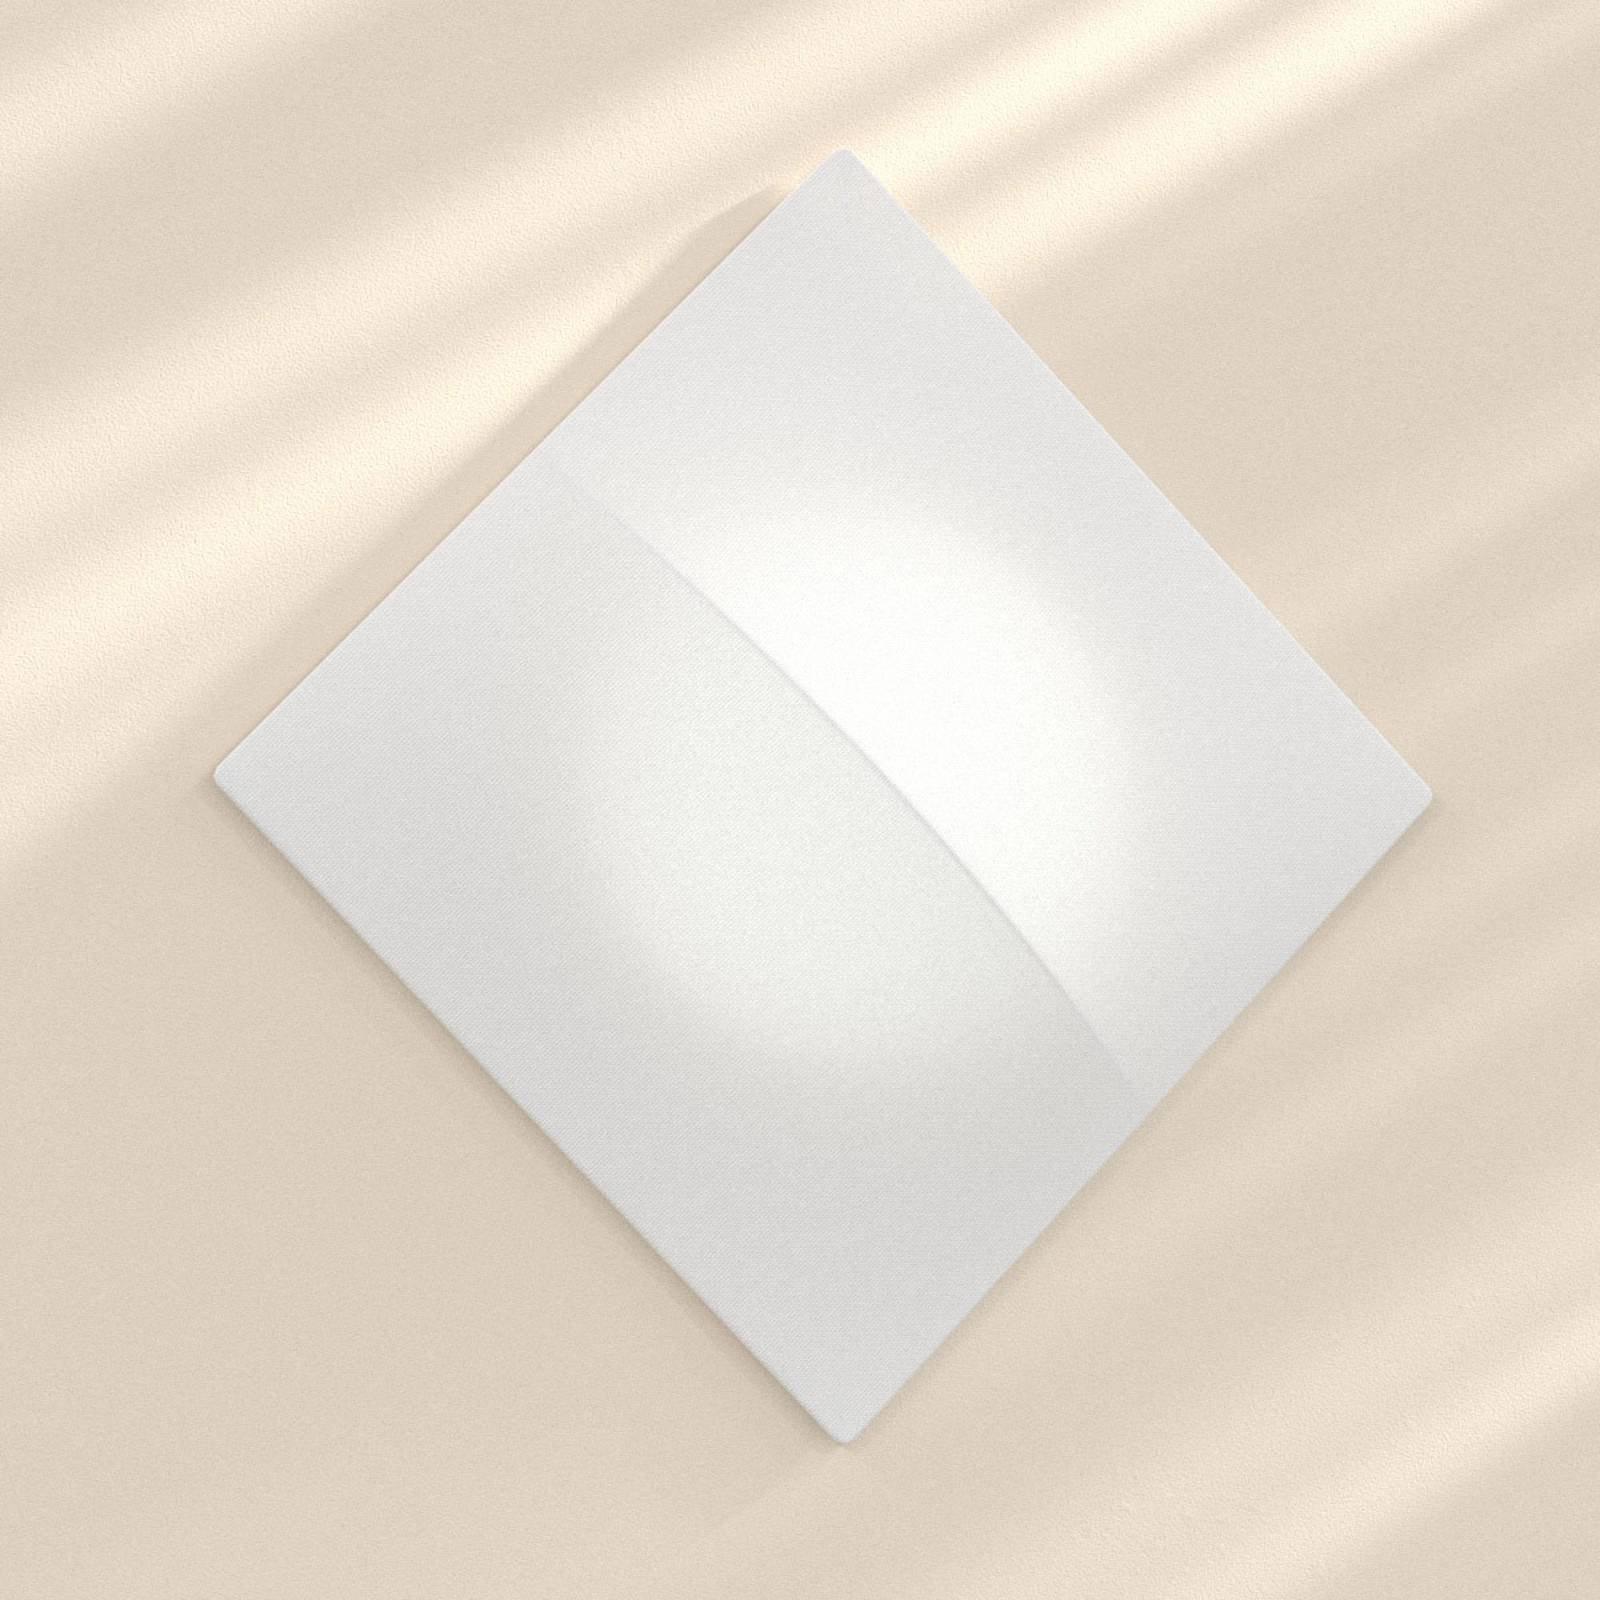 Nelly S - firkantet vegglampe med stoff, 100 cm